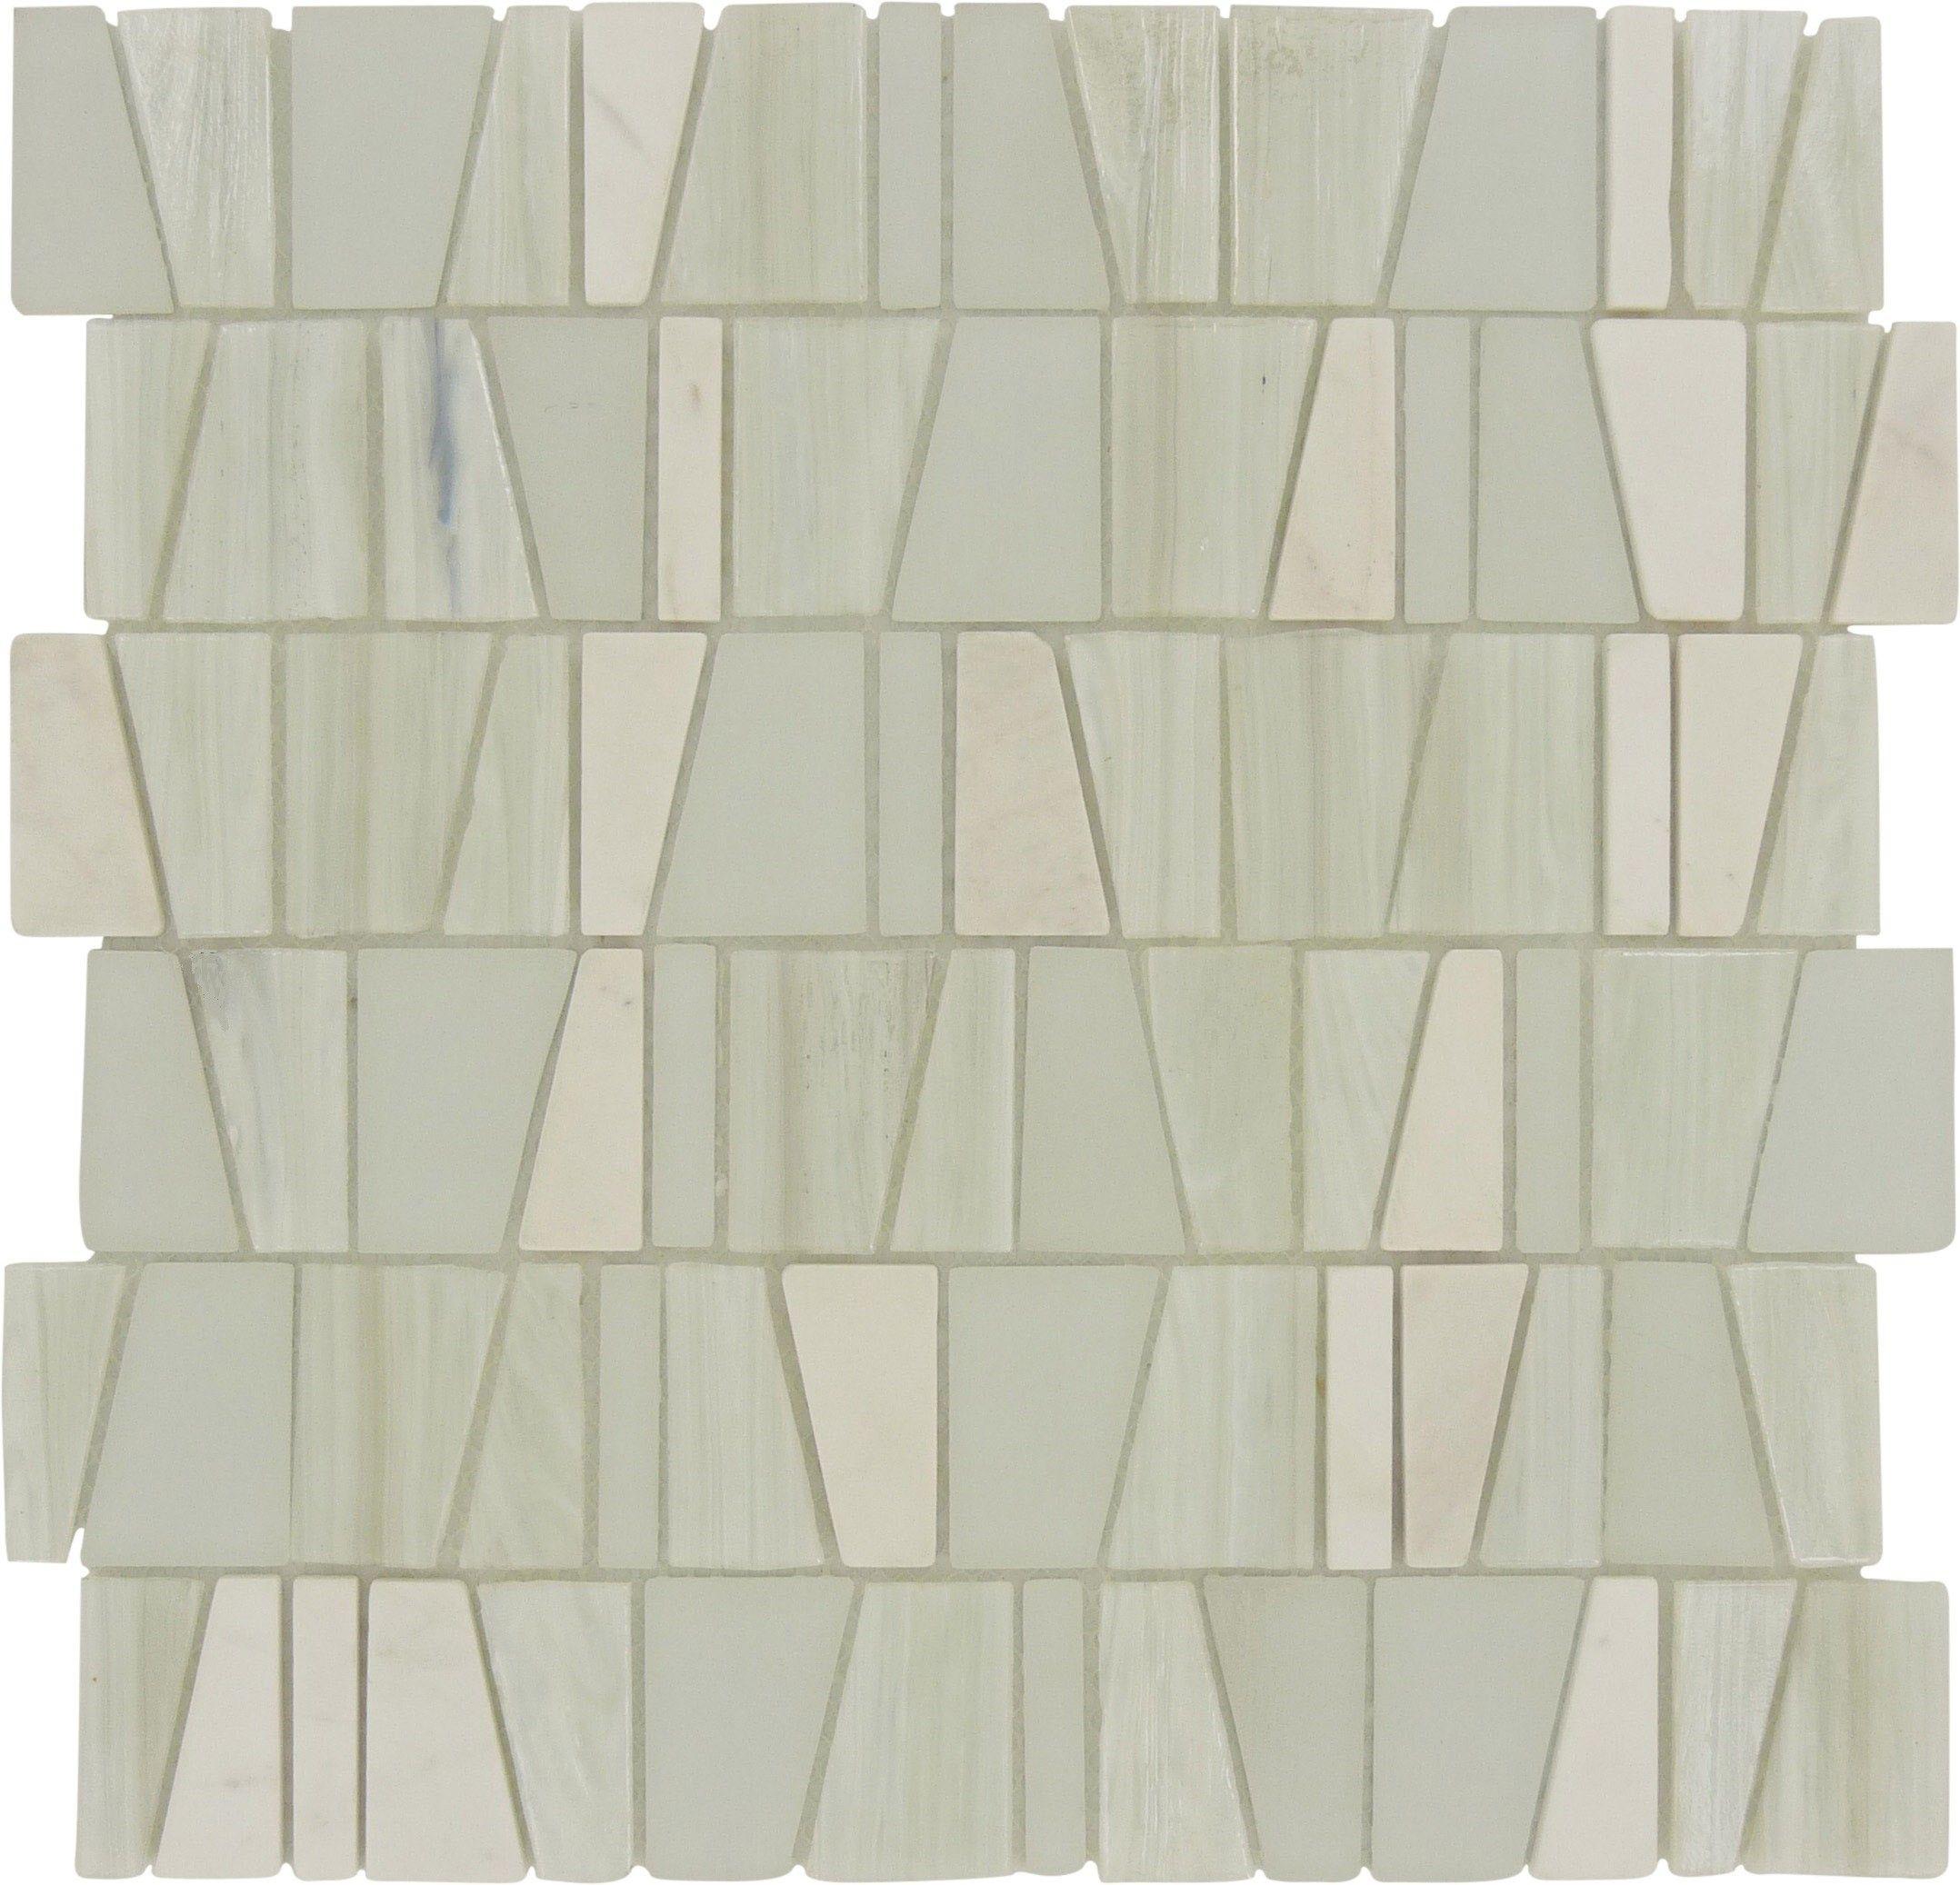 "Sheet Size: 12 3/8"" X 11 3/4"" Tile Size: Variable Tile"